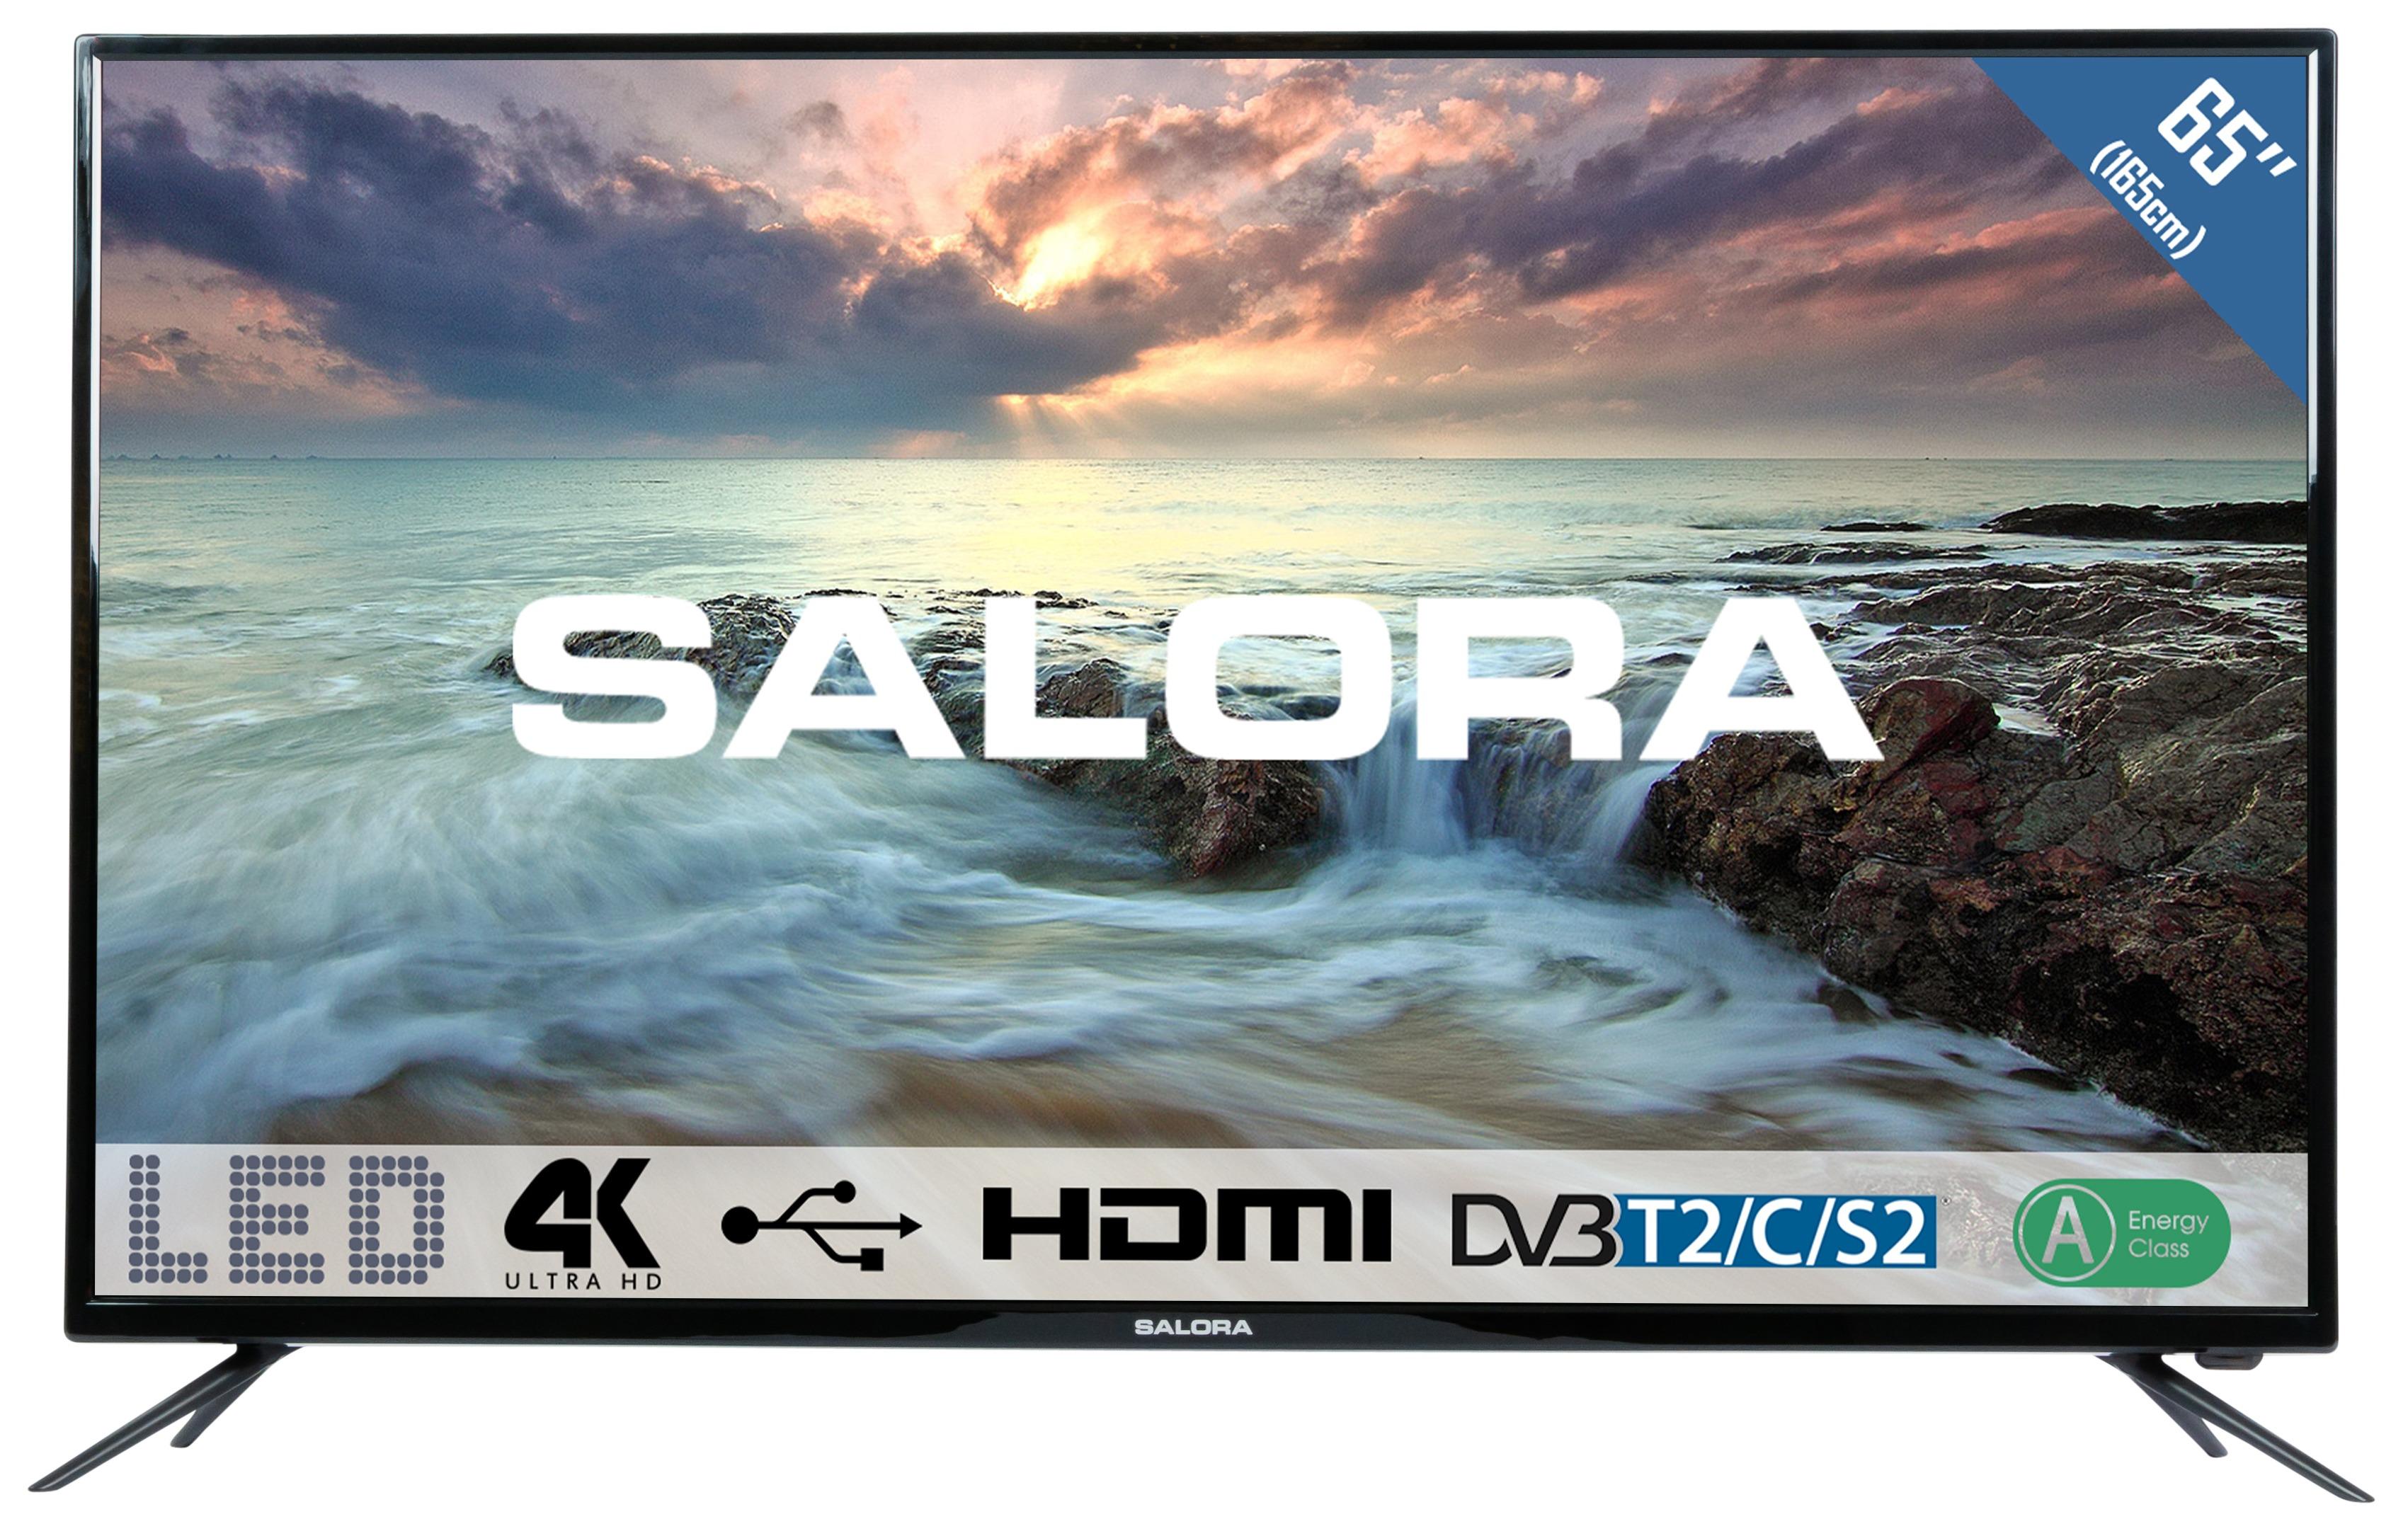 Salora 65UHL2800 65 inch UHD TV